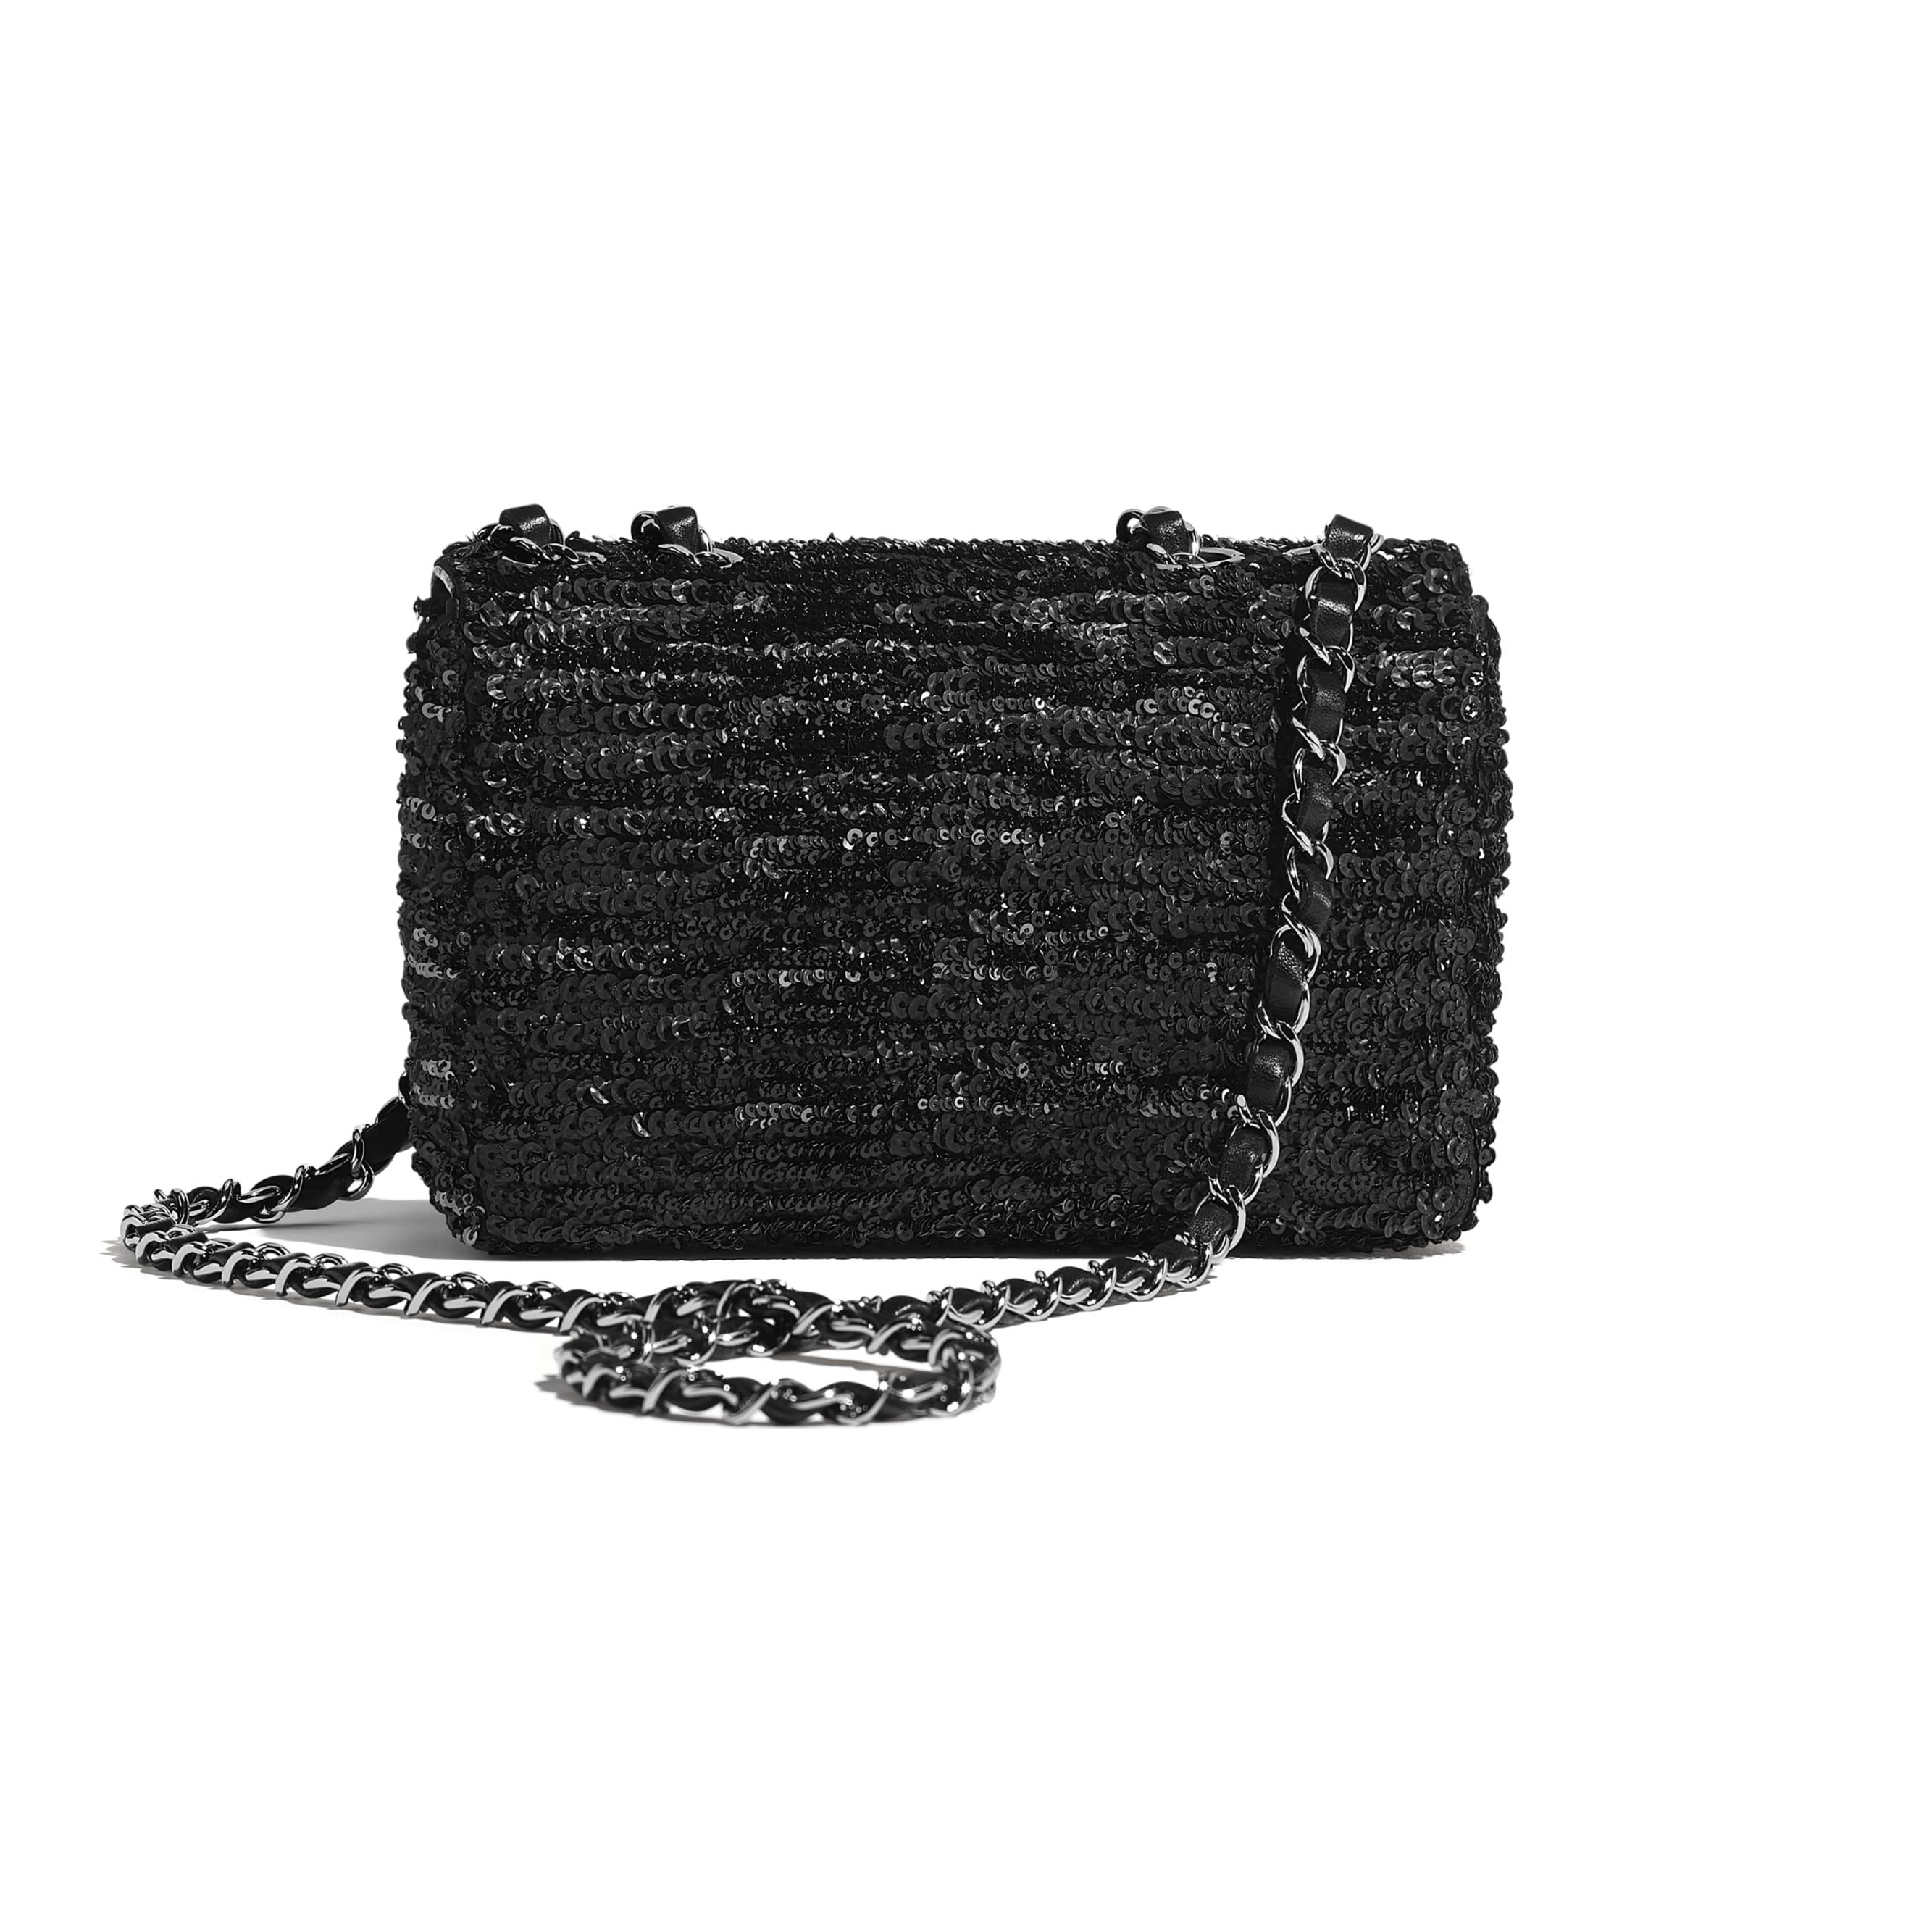 Flap Bag - Black - Sequins & Ruthenium-Finish Metal - Alternative view - see standard sized version